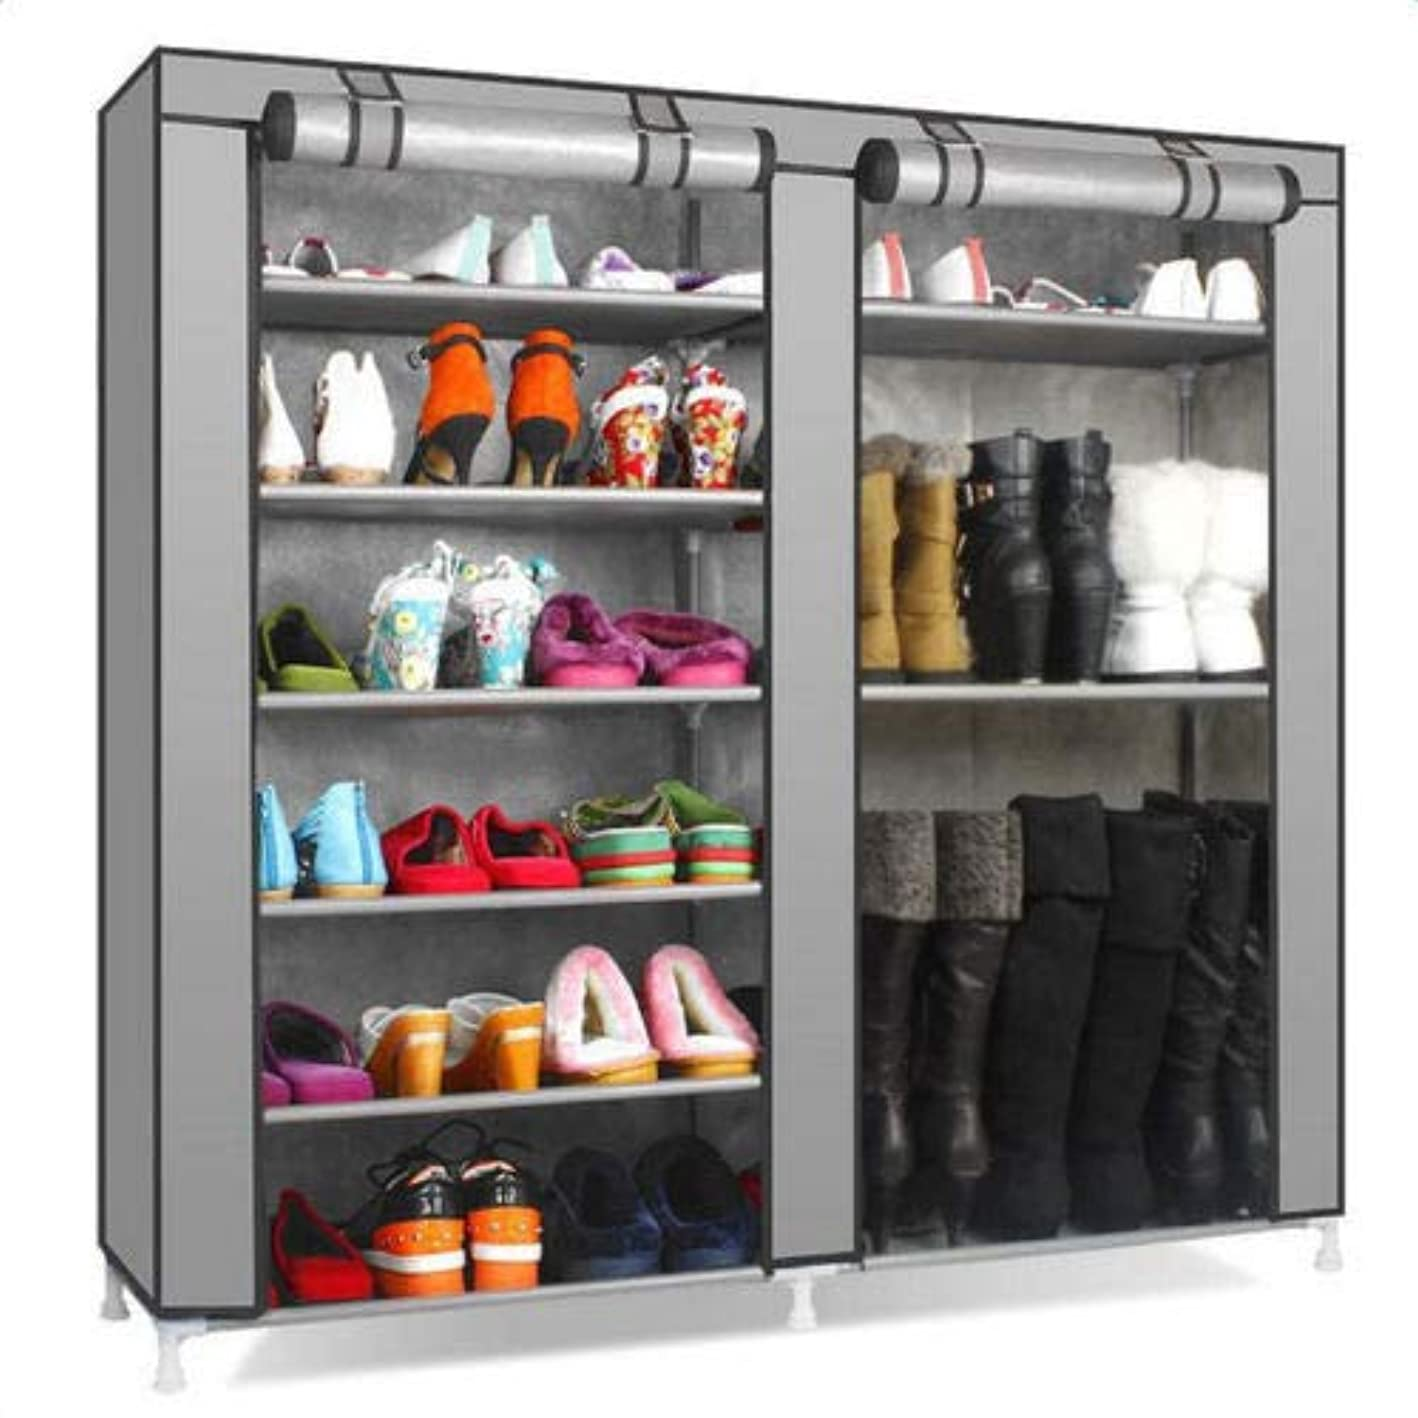 J&T Shoe Rack Closet Shelf Storage Portable Double Organizer Cabinet 9 Layer Durable Metal Shelves, Grey